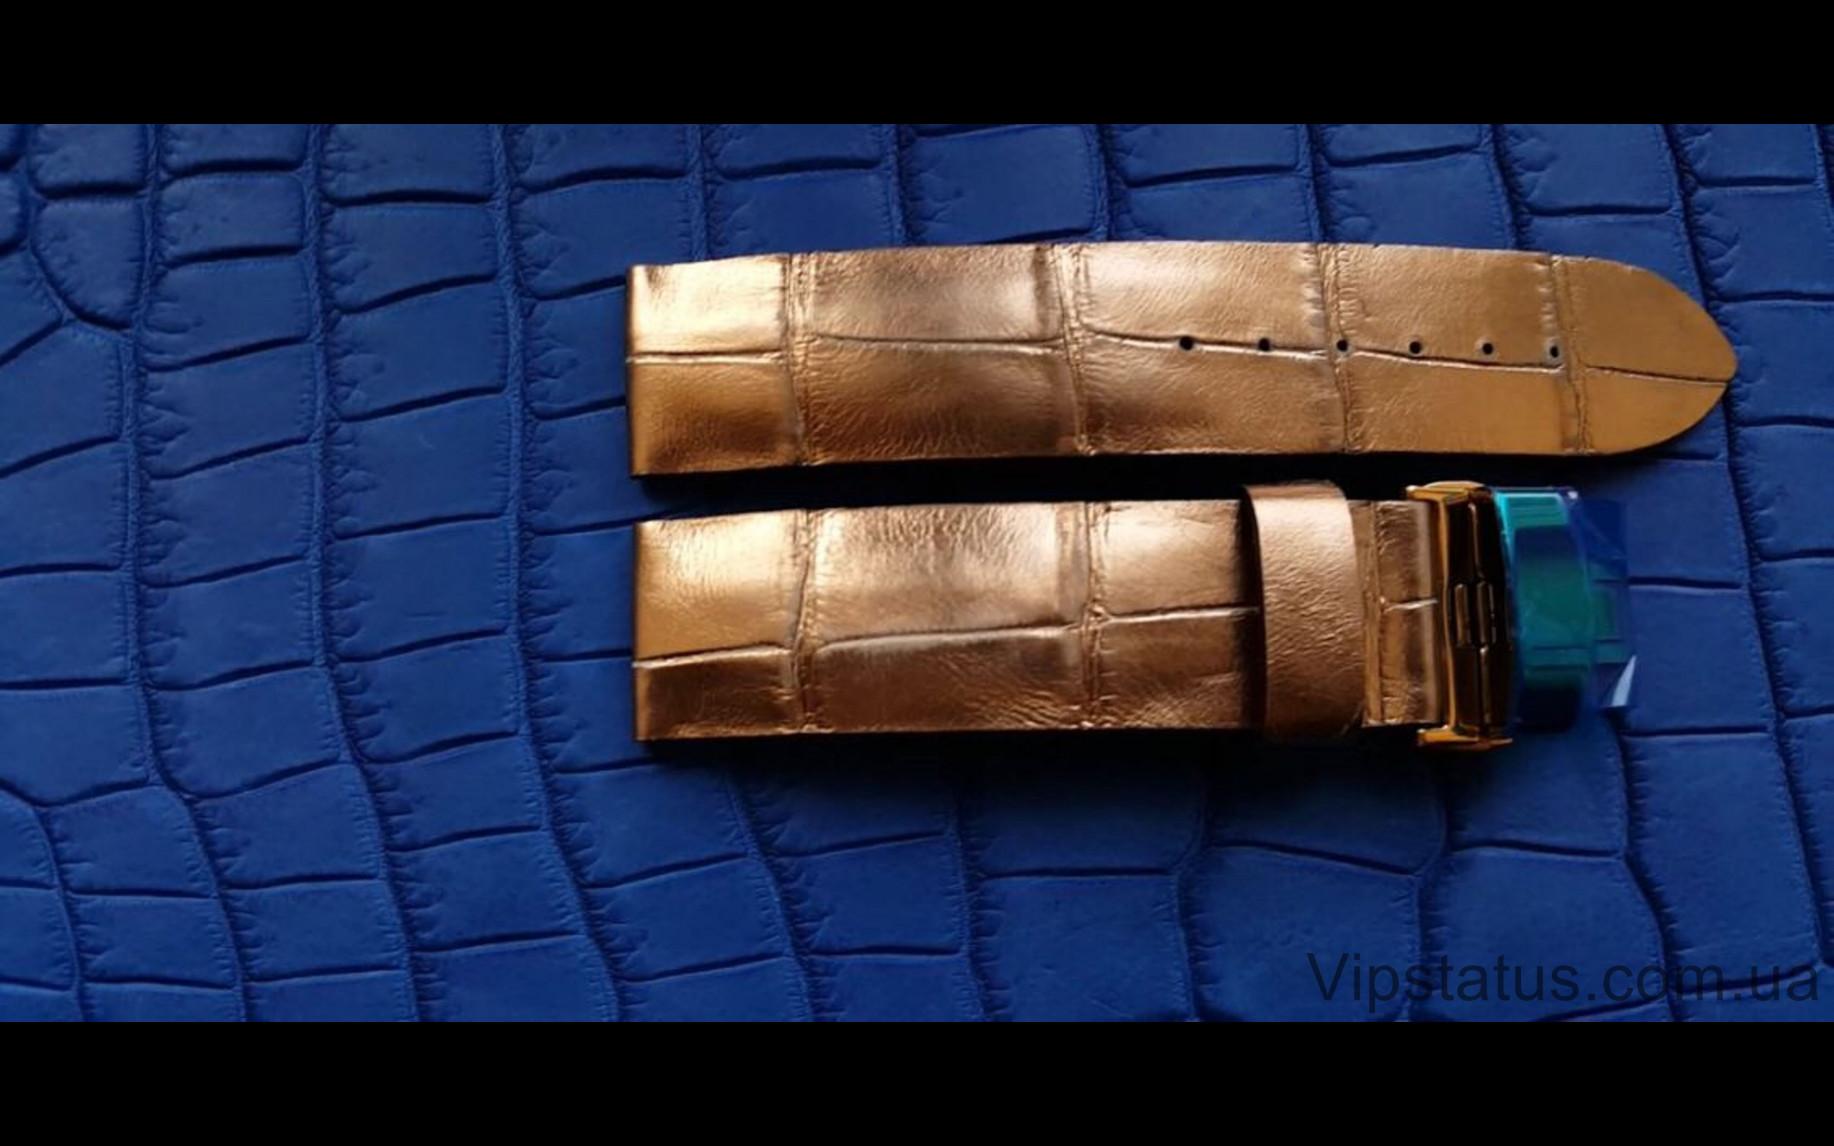 Elite Экзотический ремешок для часов Audemars Piguet кожа крокодила Exotic Crocodile Strap for Audemars Piguet watches image 3